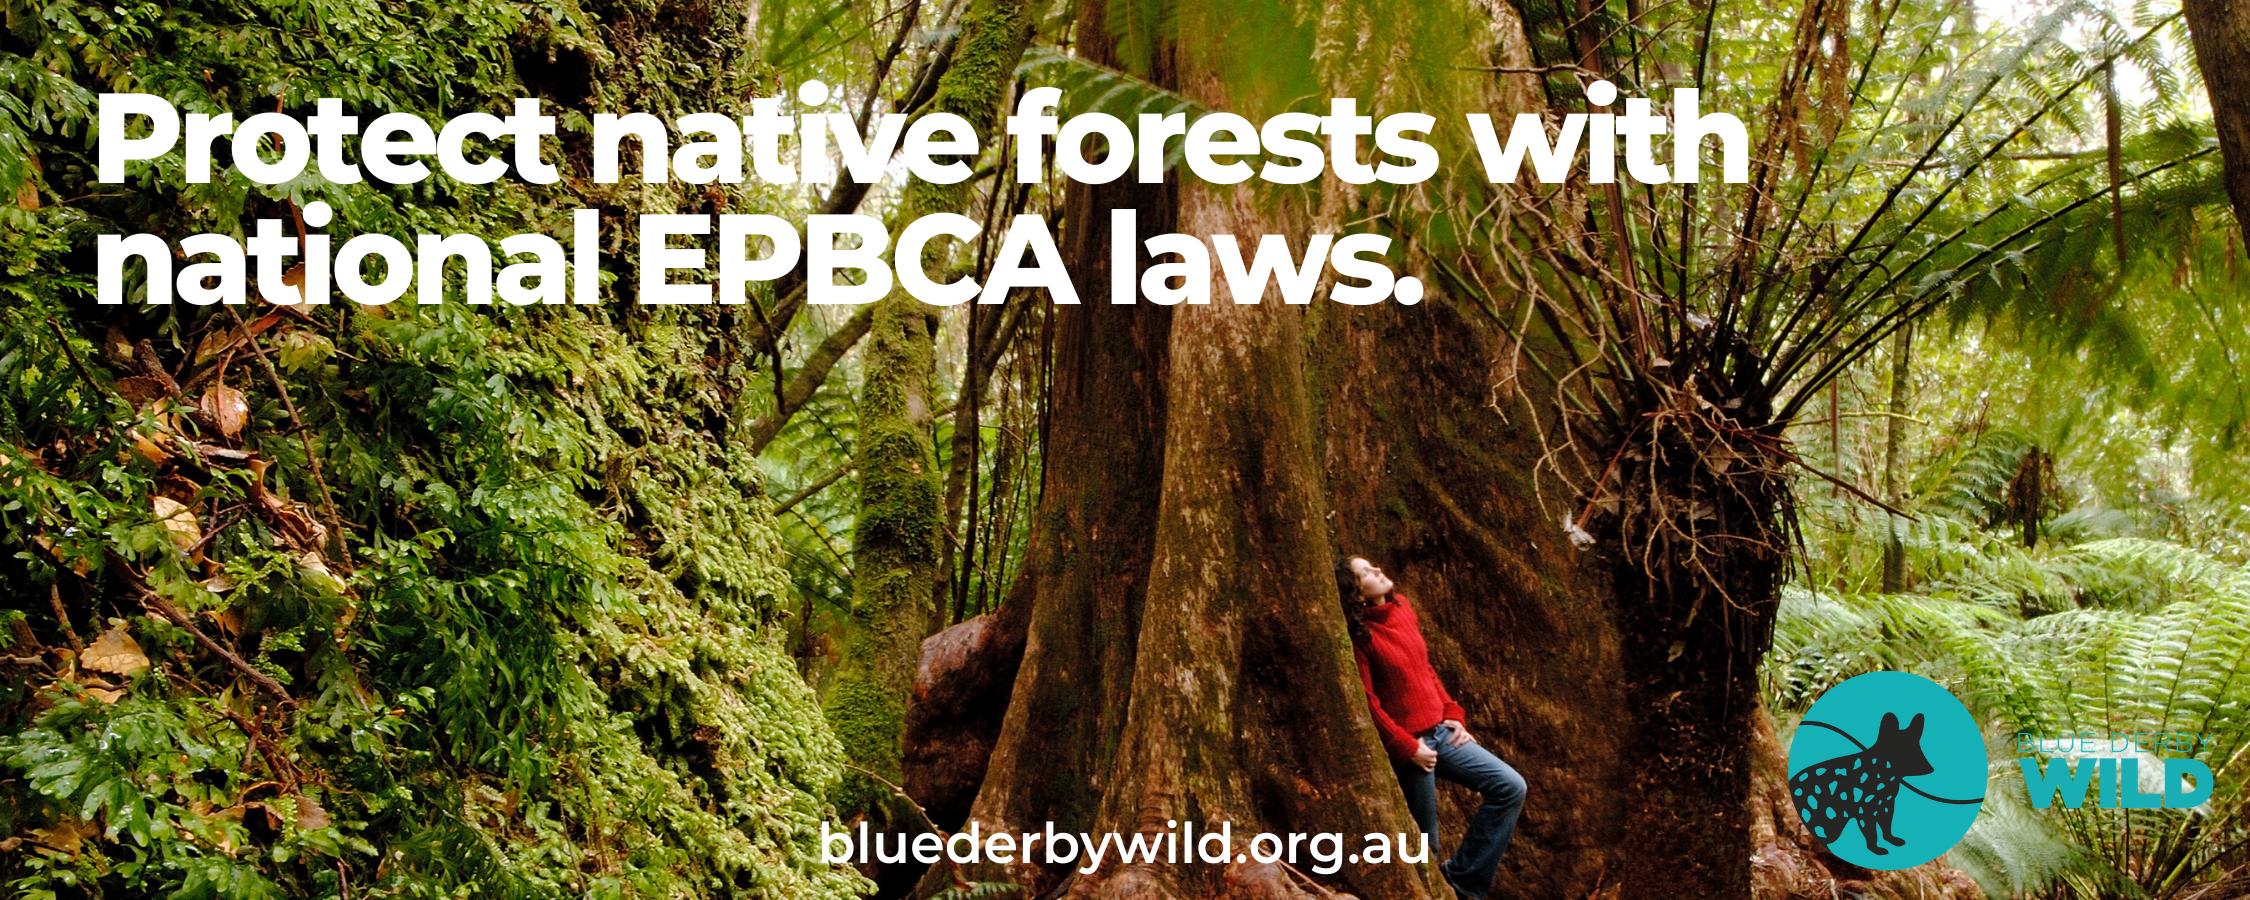 Epbca.rfa.ley_petition